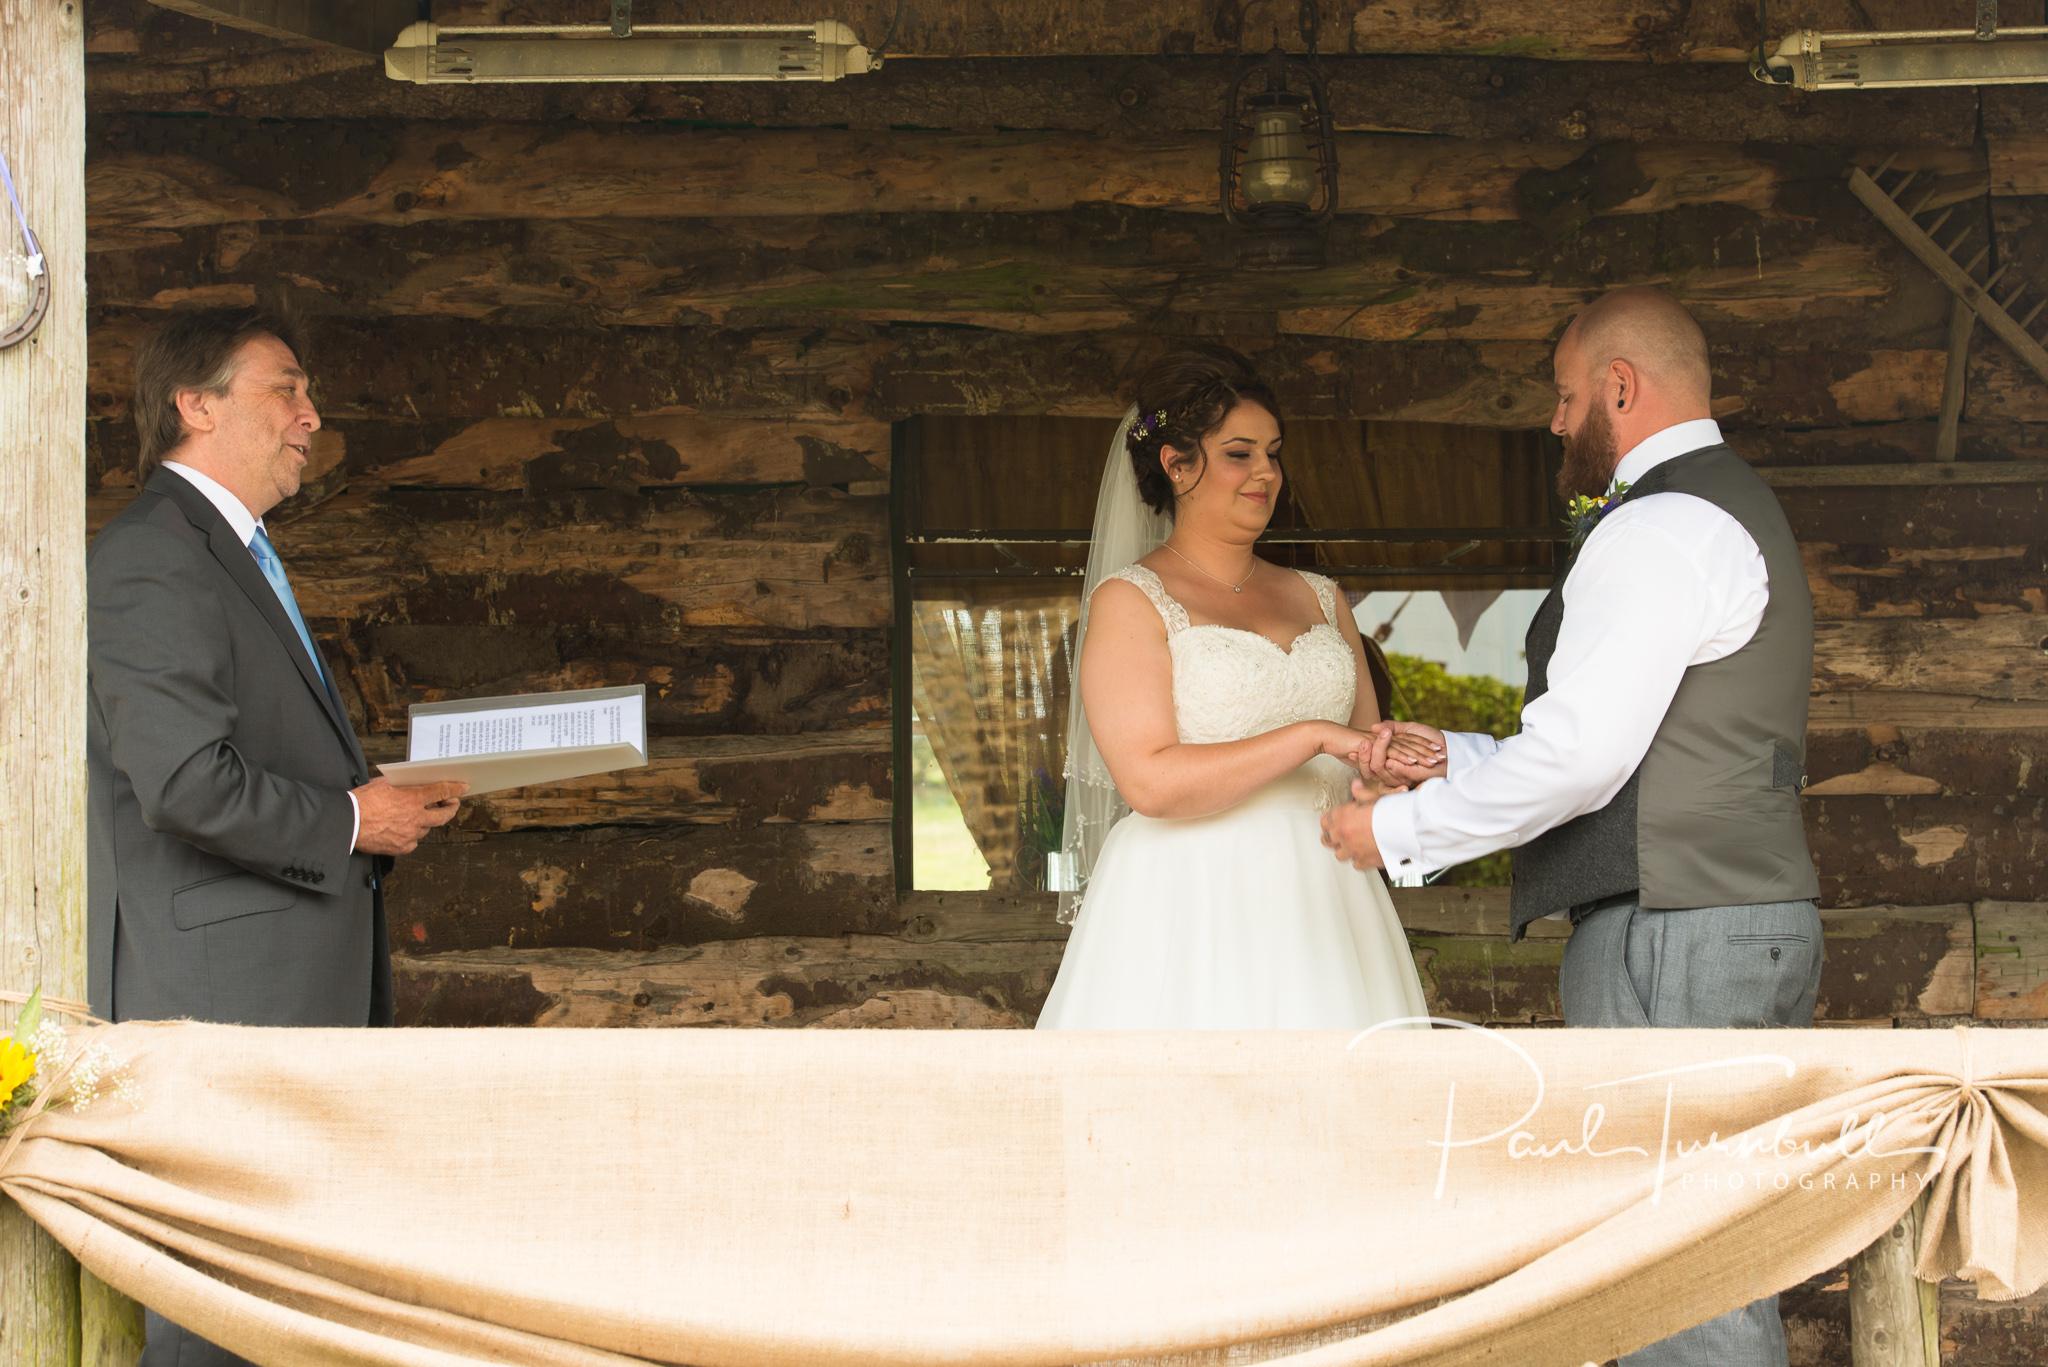 wedding-photographer-hilltop-farm-ilton-yorkshire-015.jpg